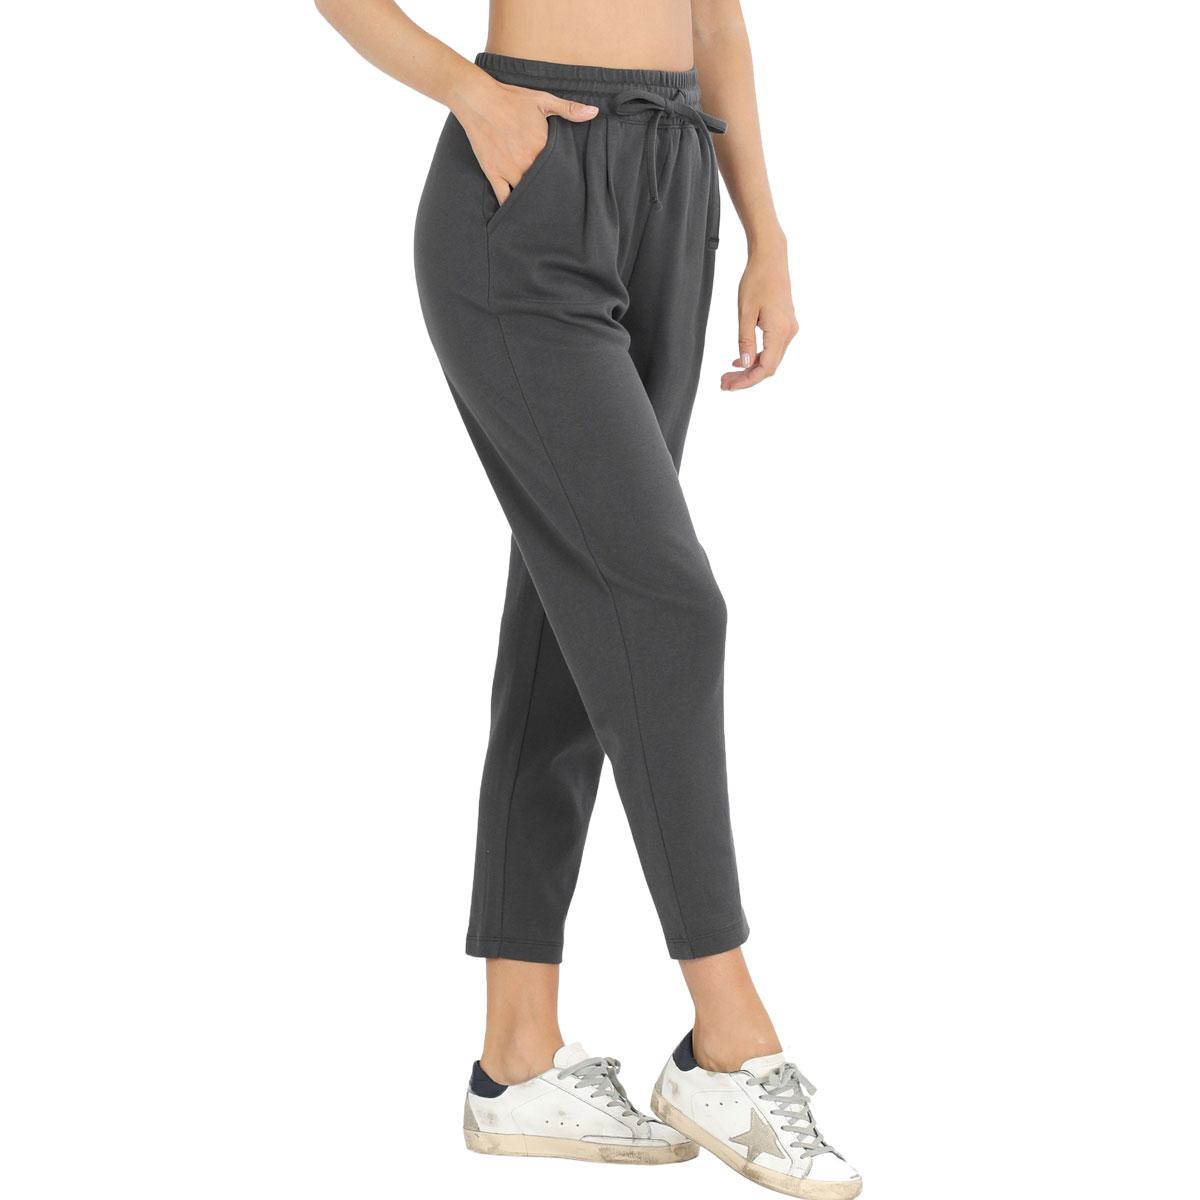 Pants - Cotton w/ Drawstring Waistband 32061 - ASH GREY Pants - Cotton w/ Drawstring Waistband 32061